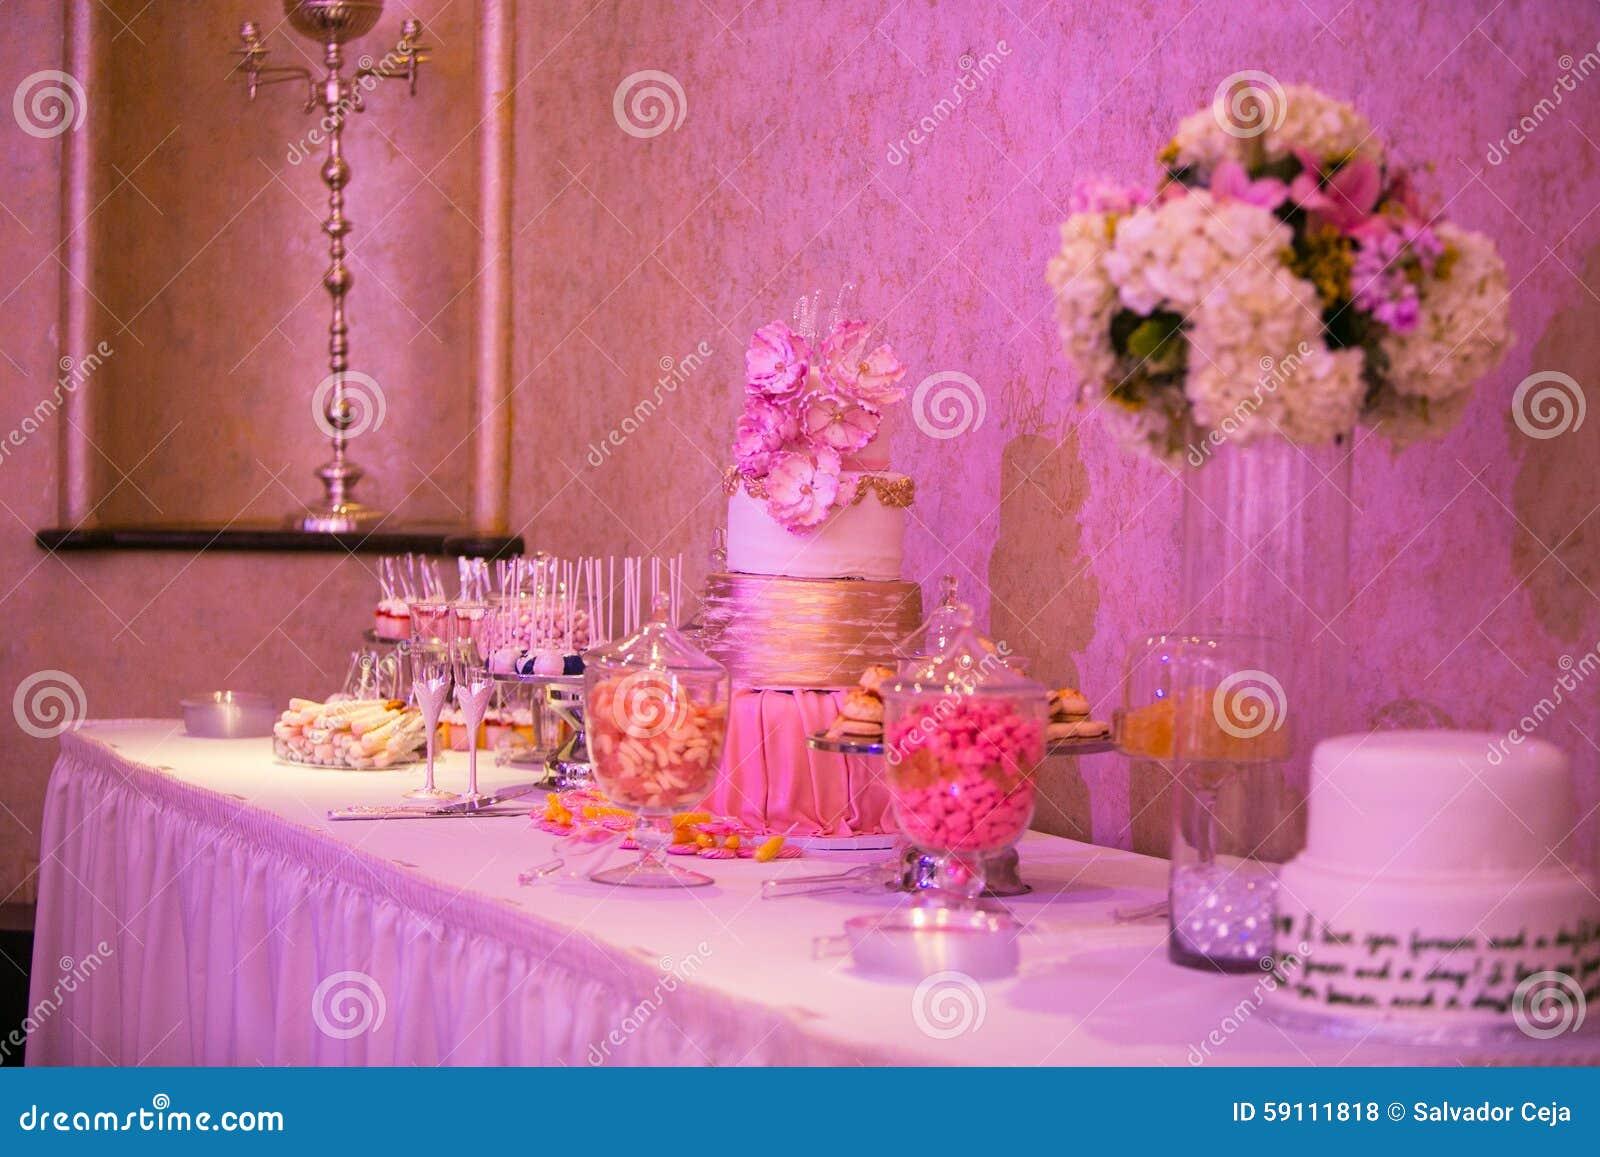 Candy bar table stock photo. Image of dark, light, arrangement ...